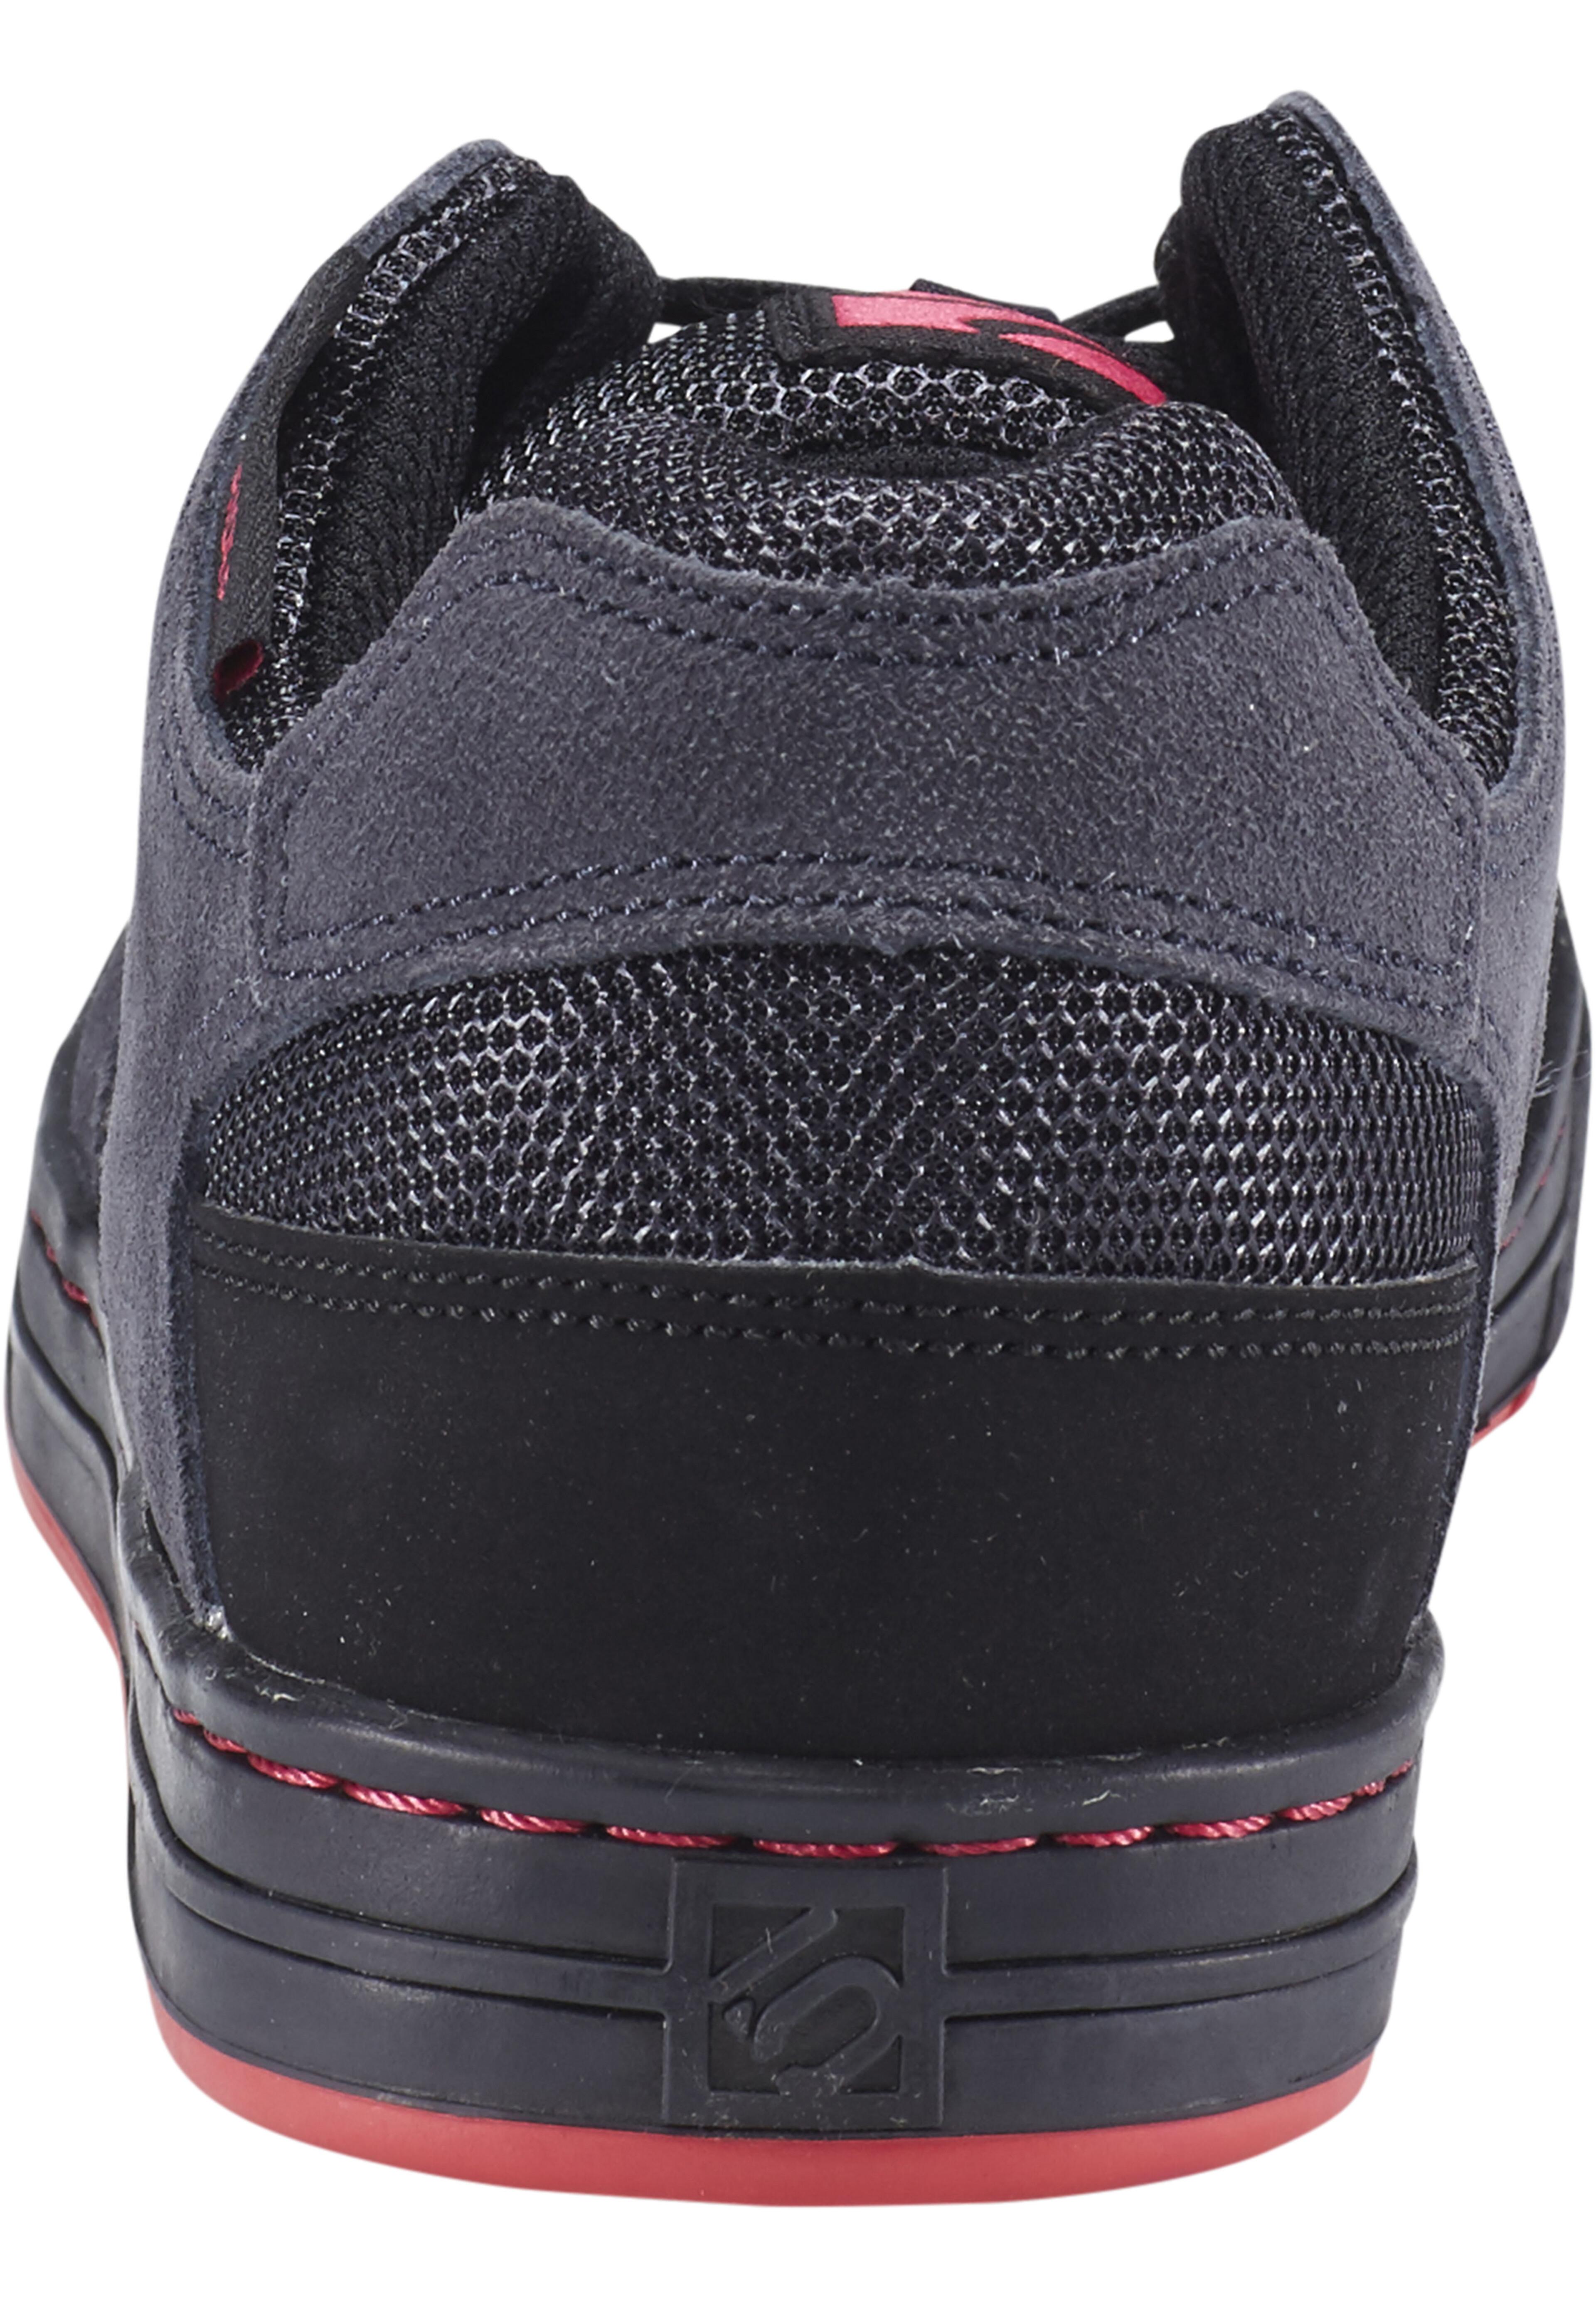 five ten freerider shoes women black berry online bei. Black Bedroom Furniture Sets. Home Design Ideas